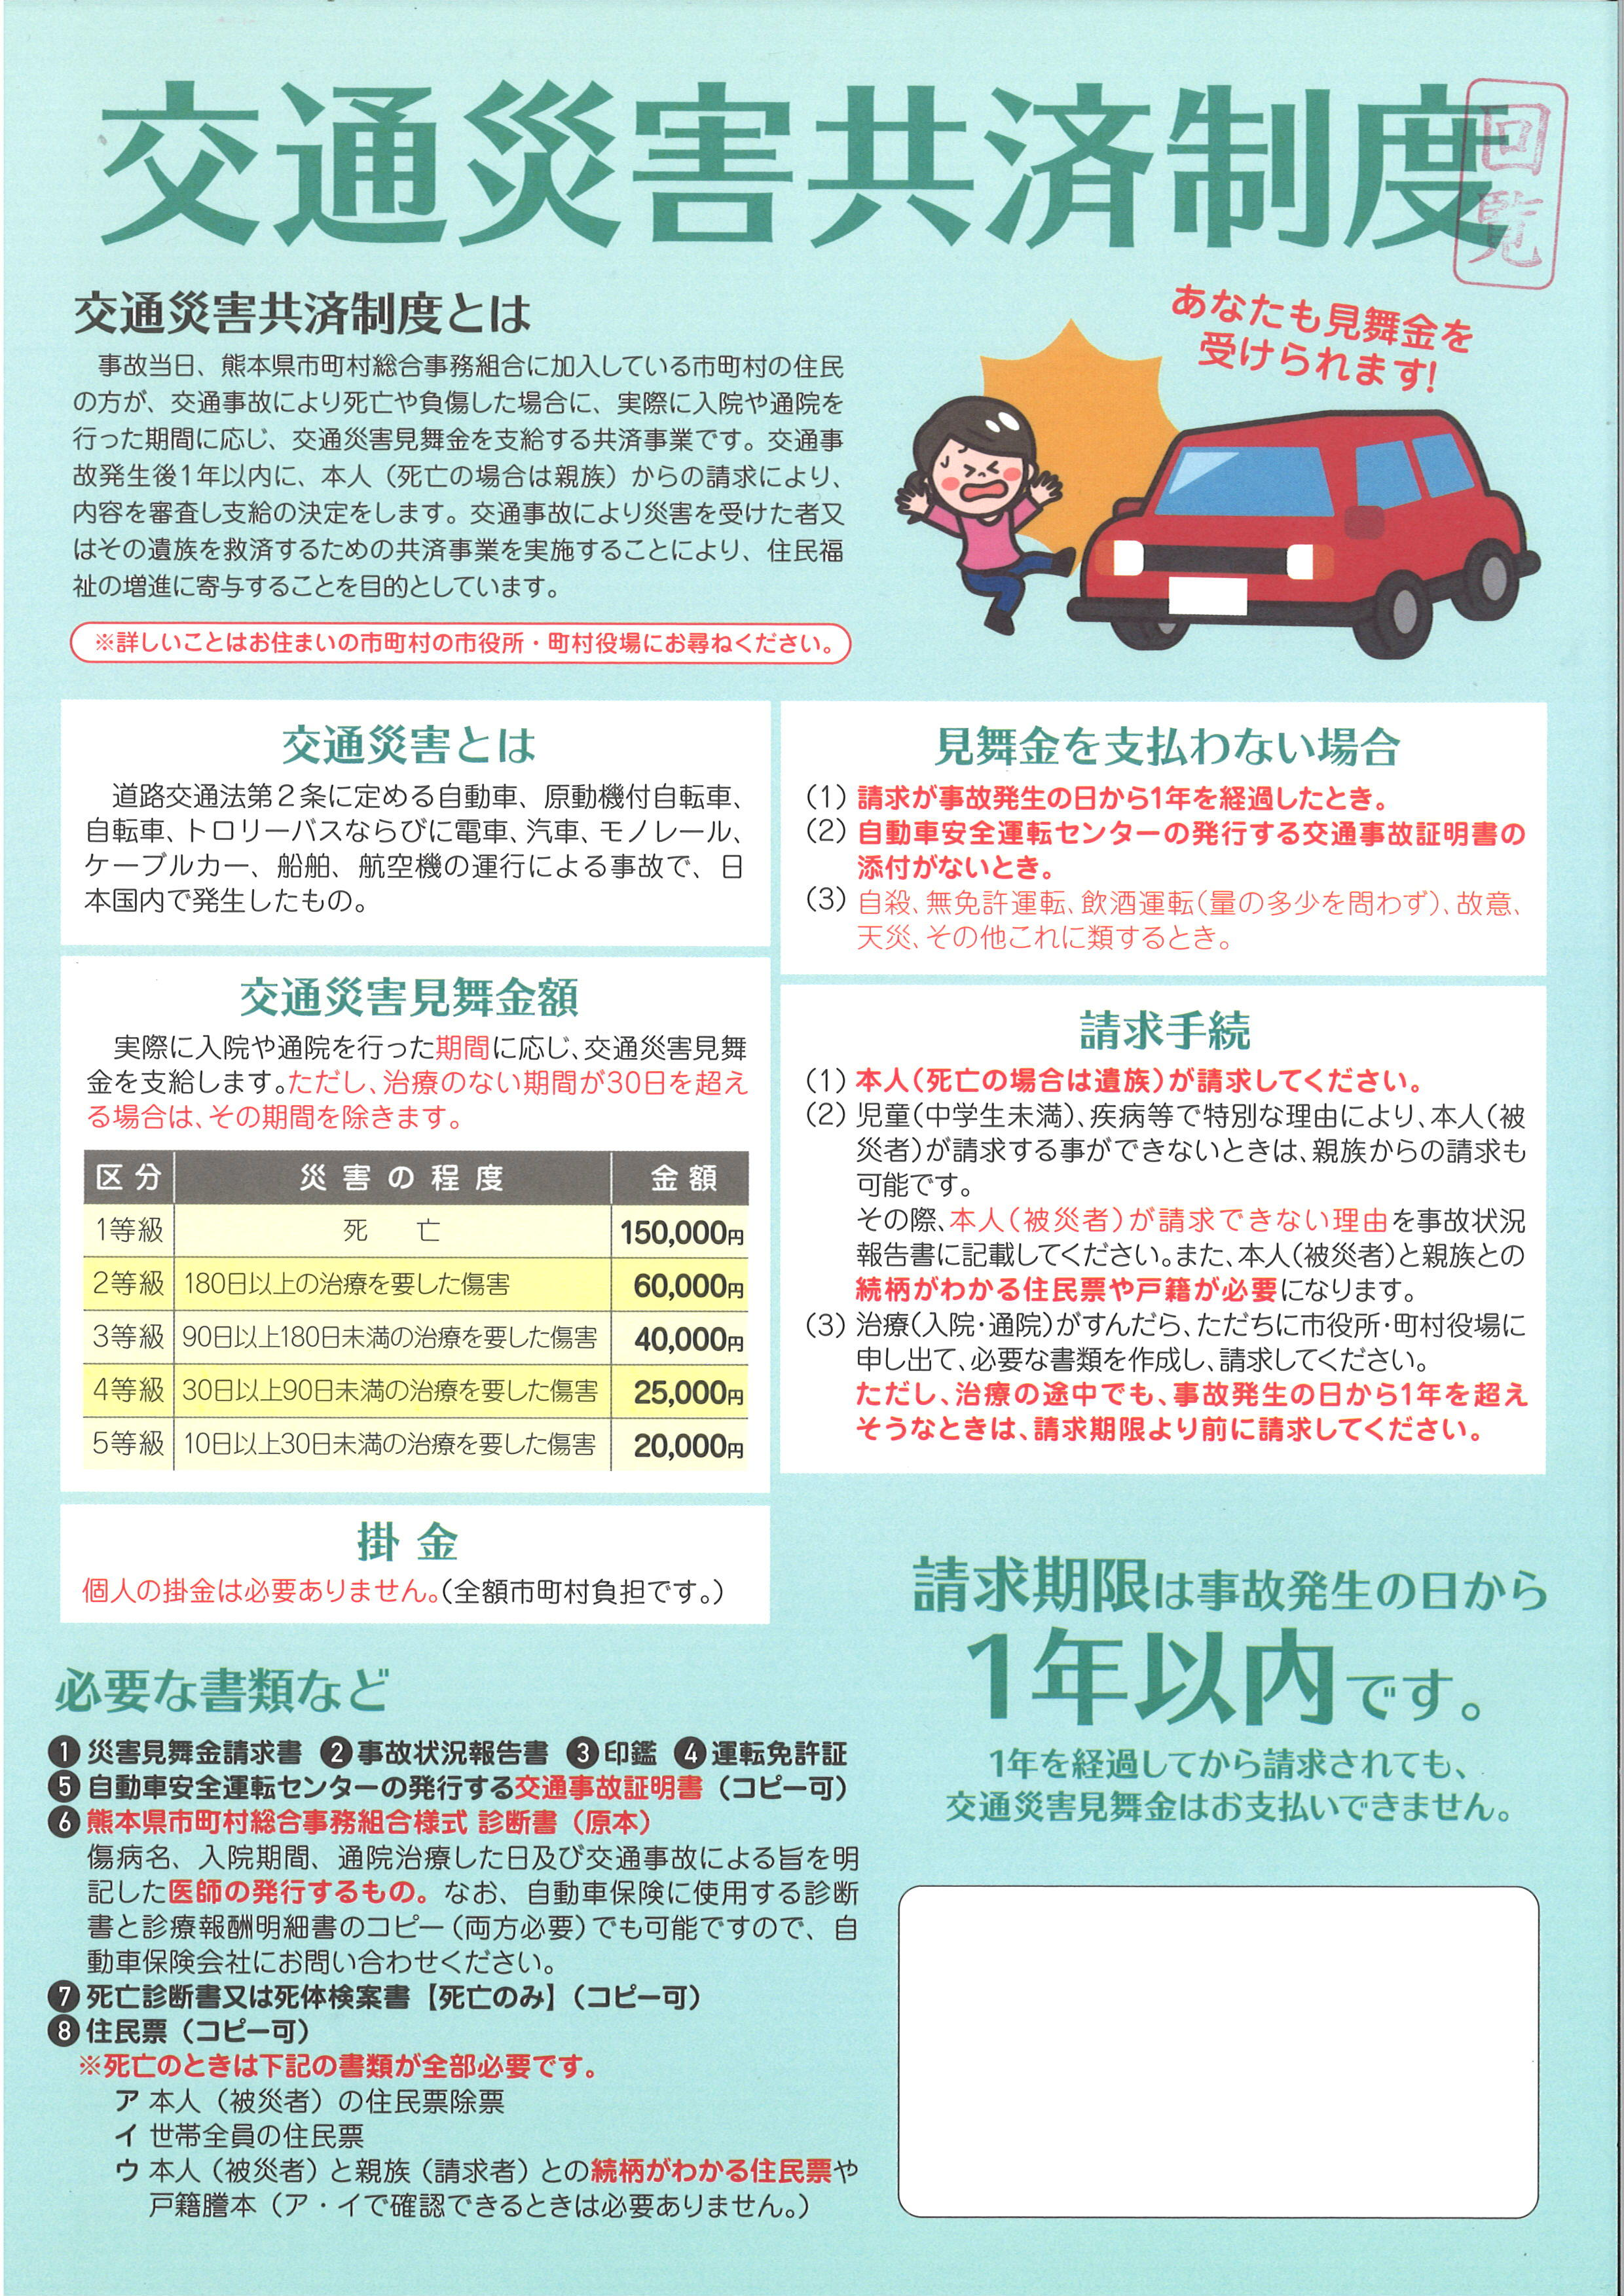 http://www.town.takamori.kumamoto.jp/chosha/somu/upload/221286037cbaef891605ea74b8fdcbc482372d68.jpg